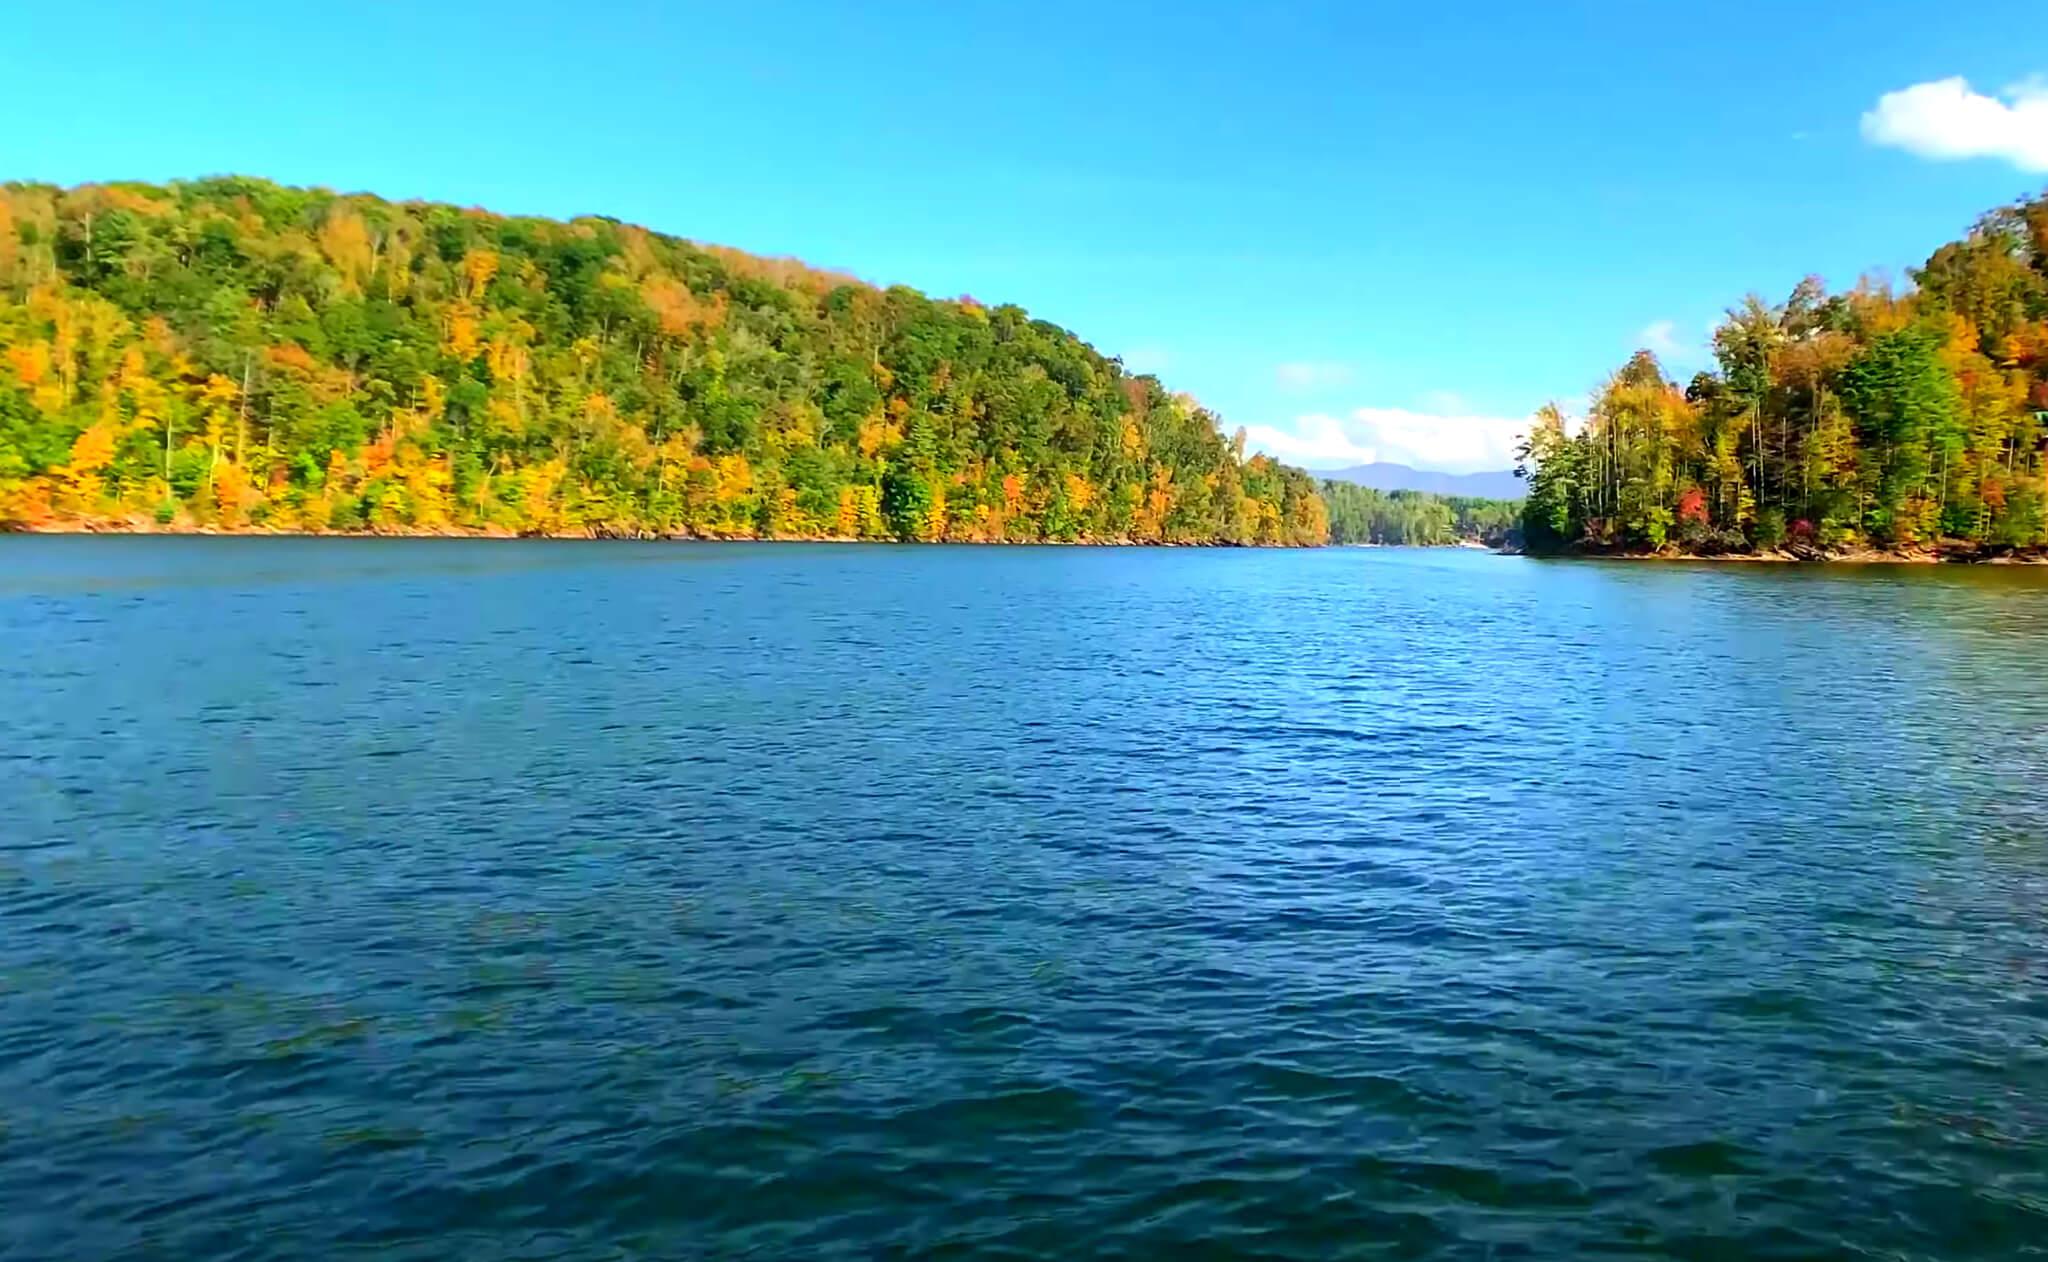 Watauga-Lake-Fishing-Report-Guide-Tennessee-TN-07